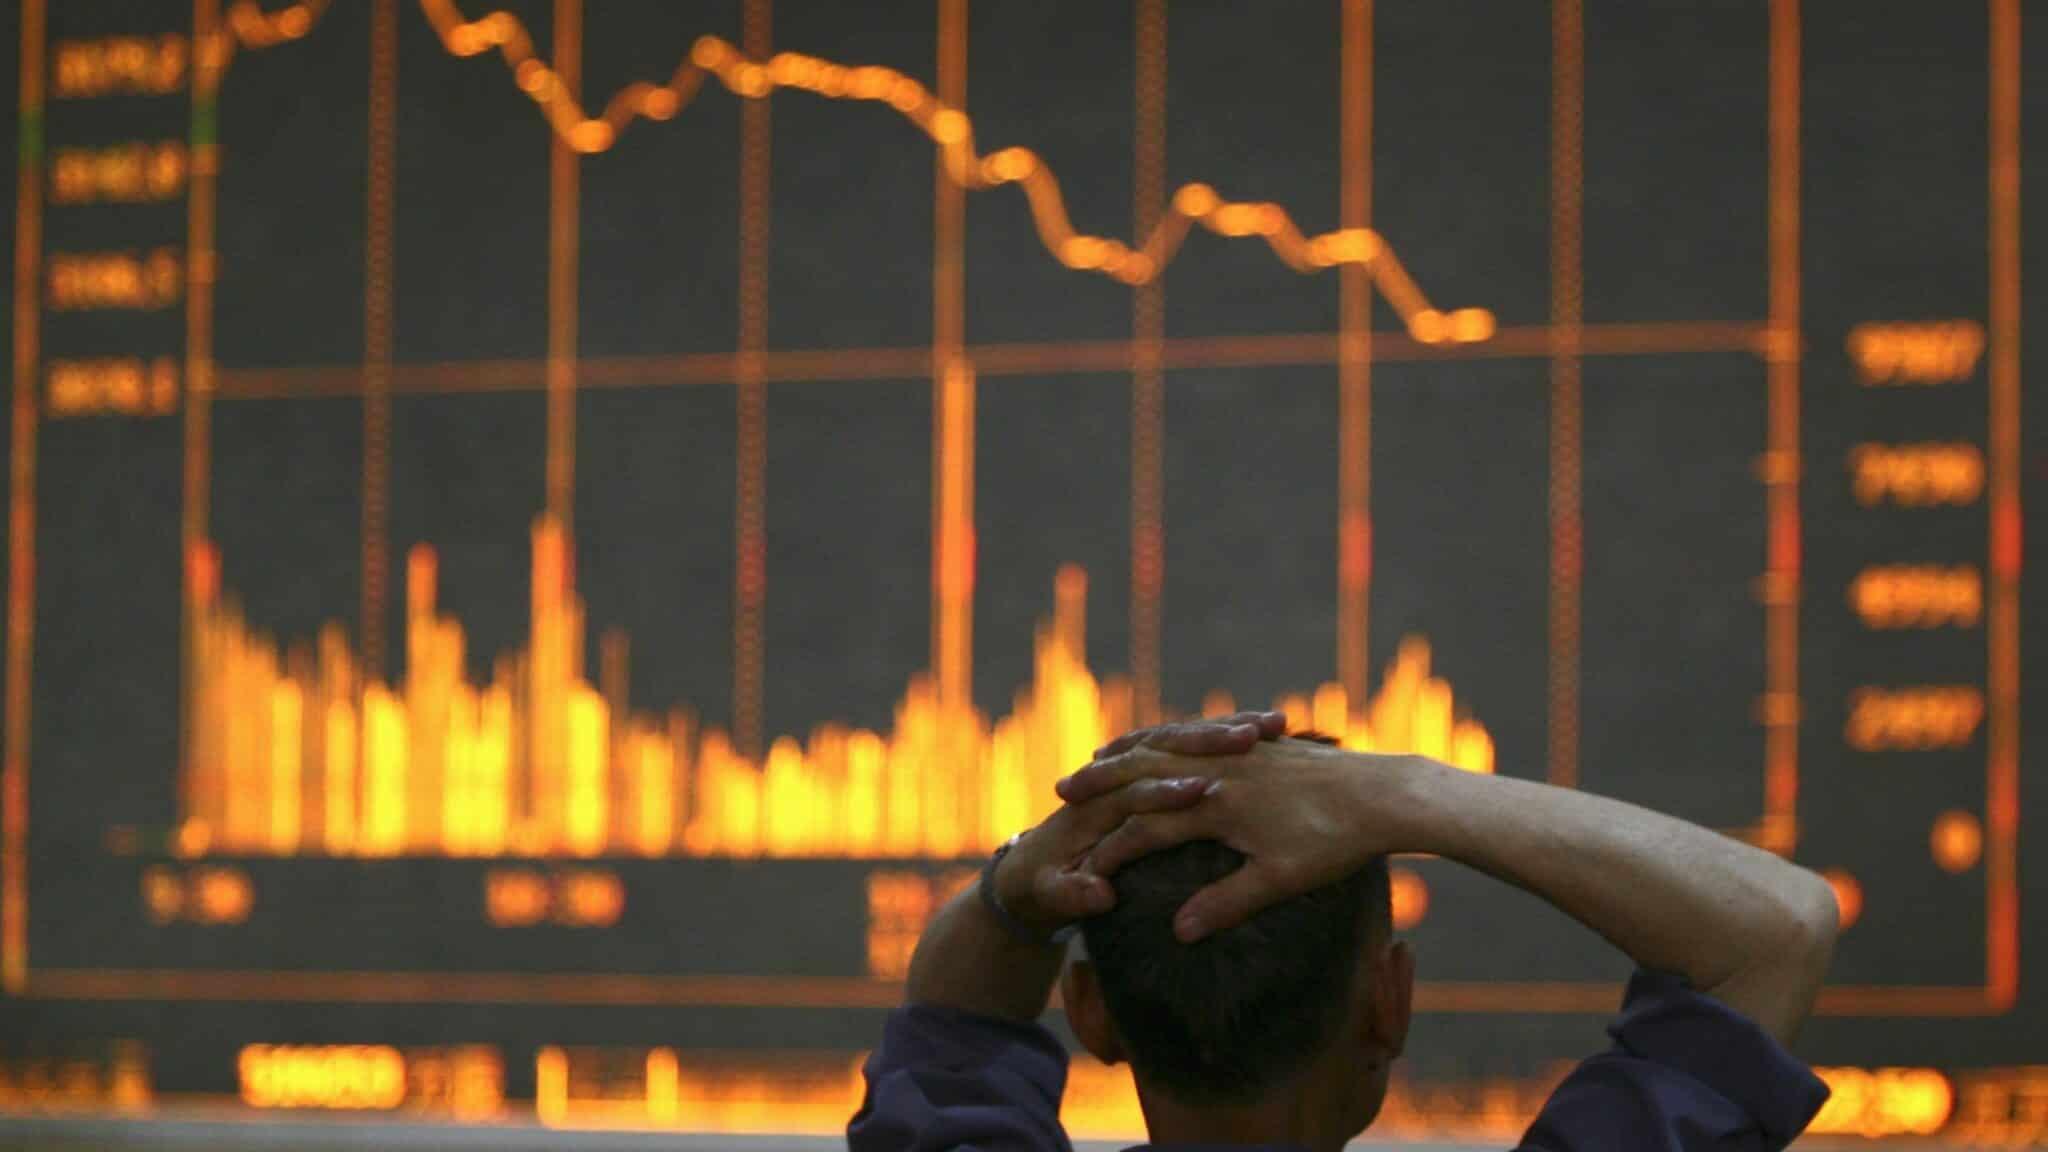 Цена биткоина упала ниже $32 тысяч